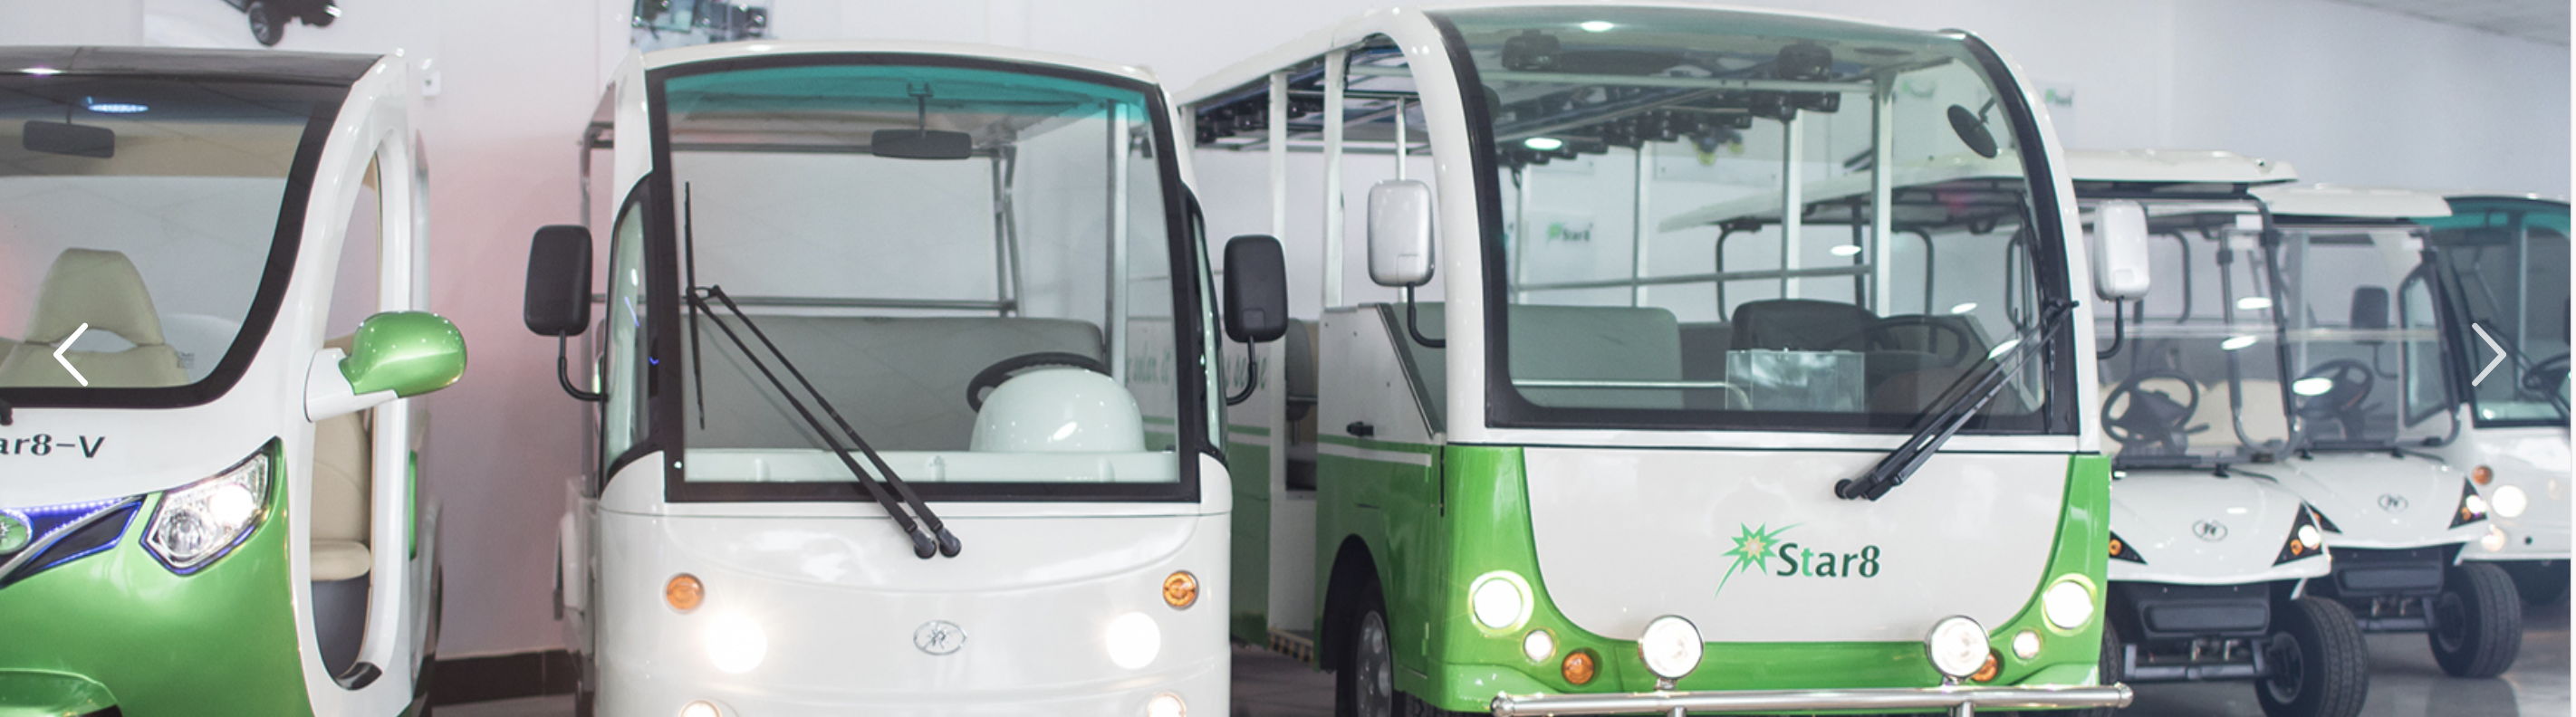 Journey Towards a Greener Transportation